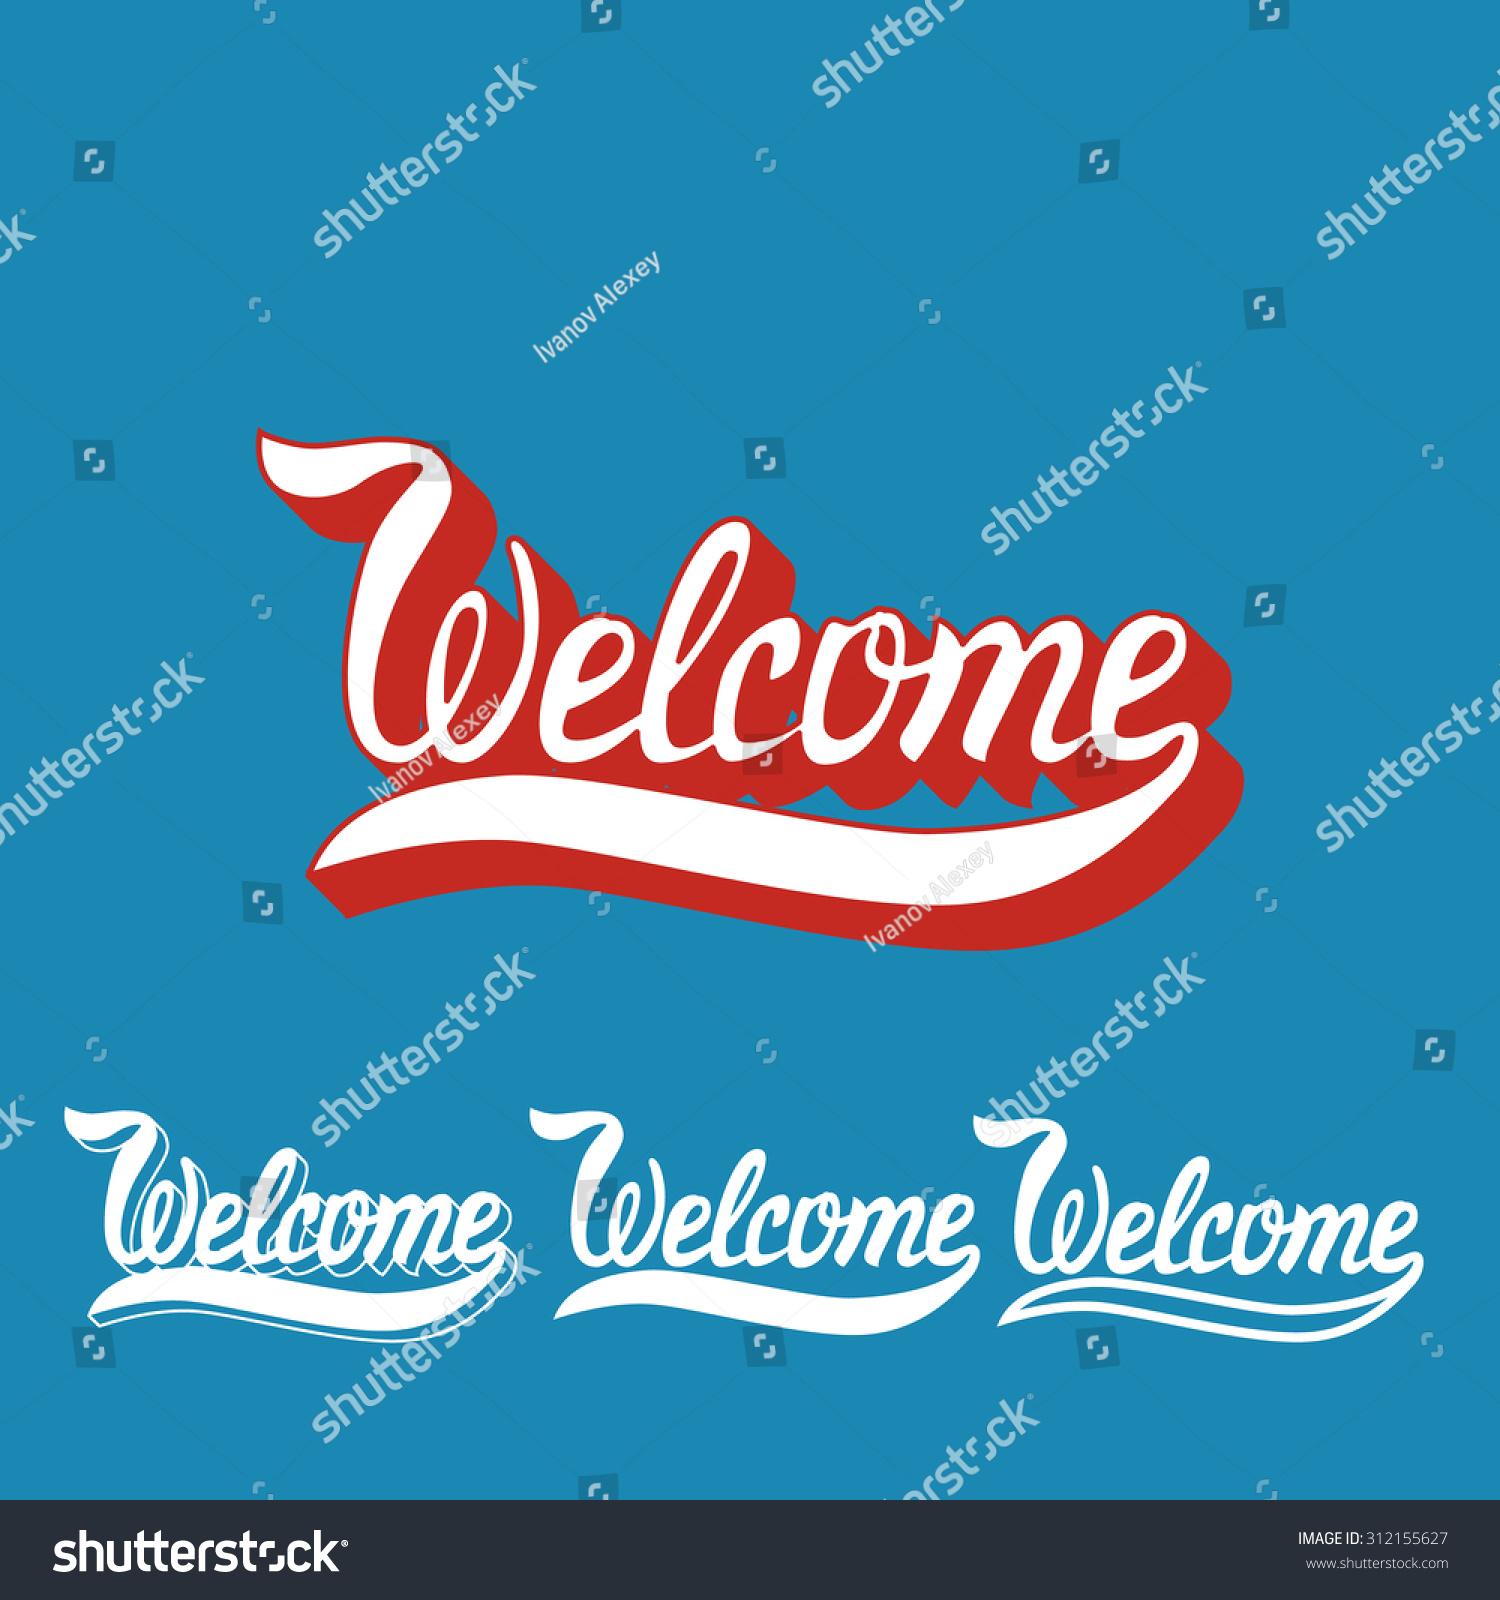 Royalty Free Stock Illustration Of Illustration Handdrawn Words